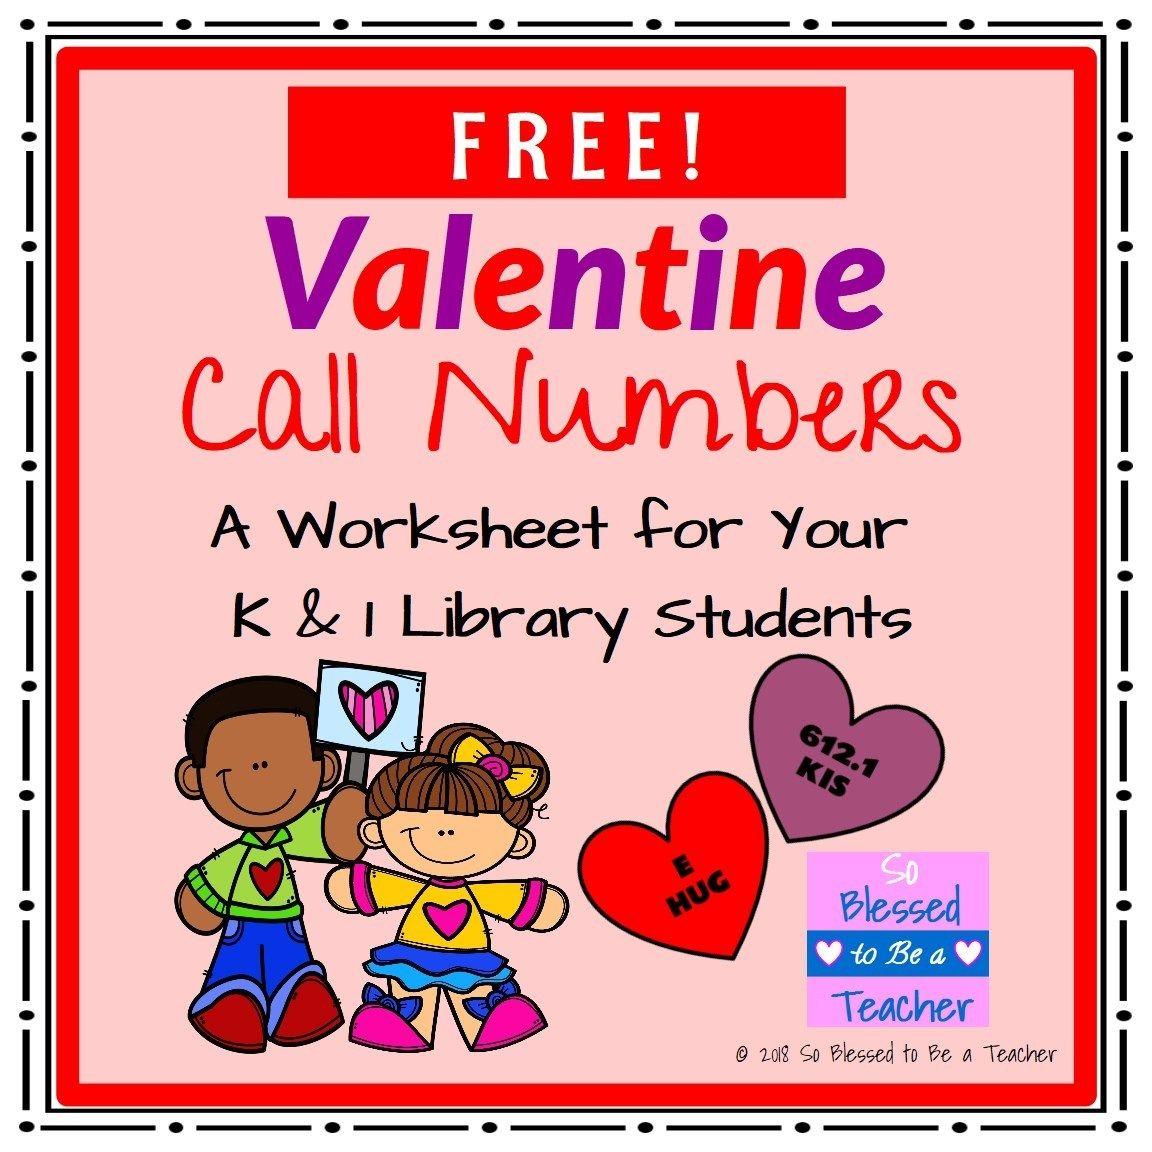 Free Valentine Call Numbers